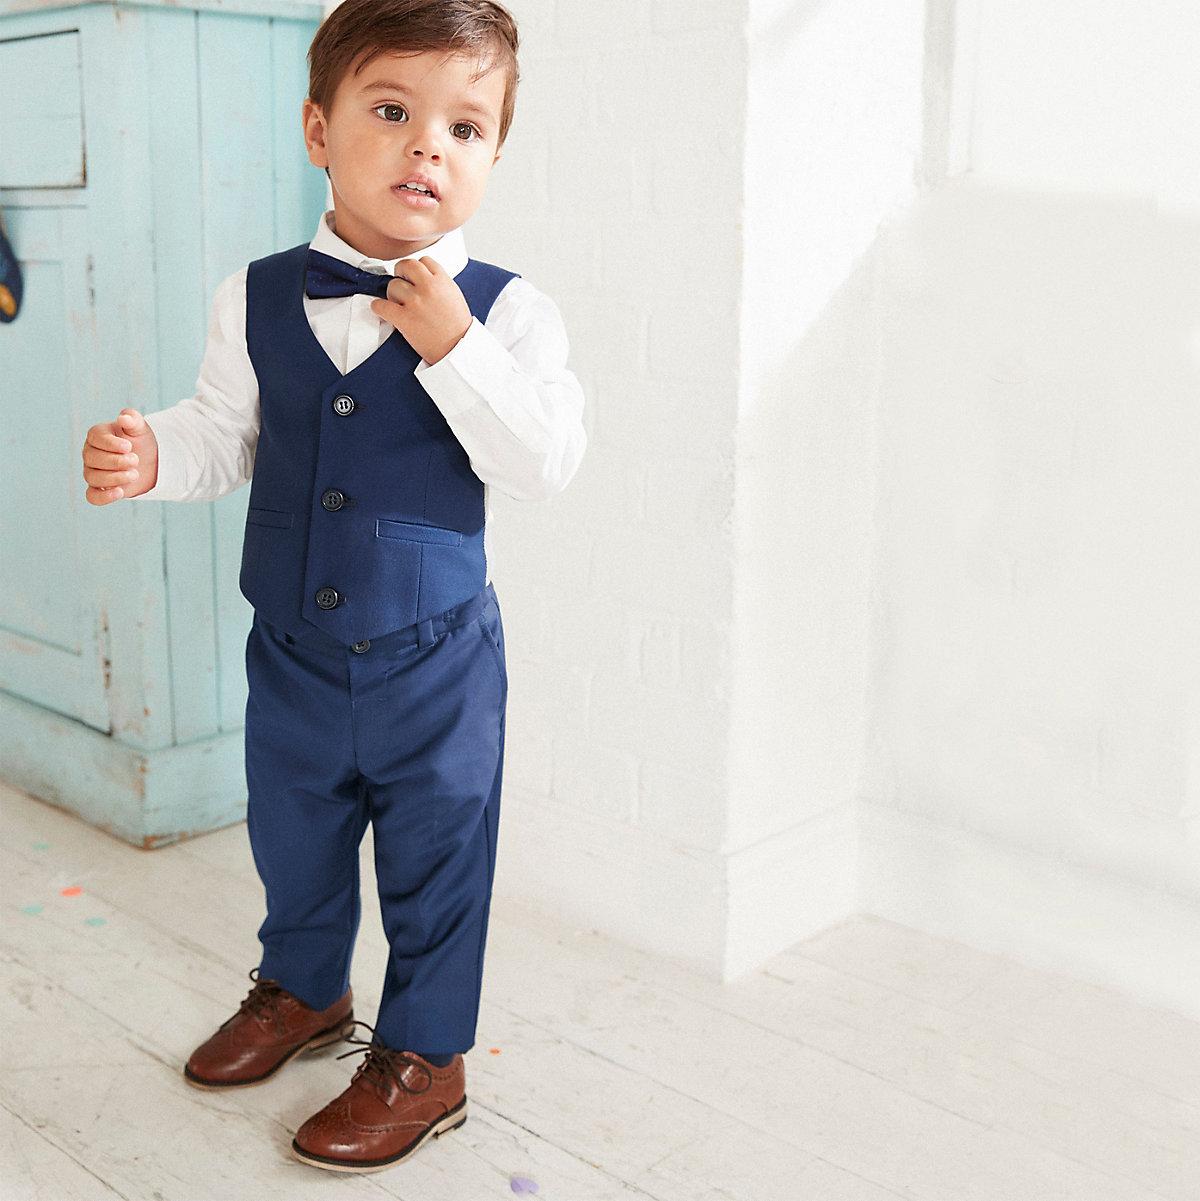 Mini boys navy shirt and pants suit set